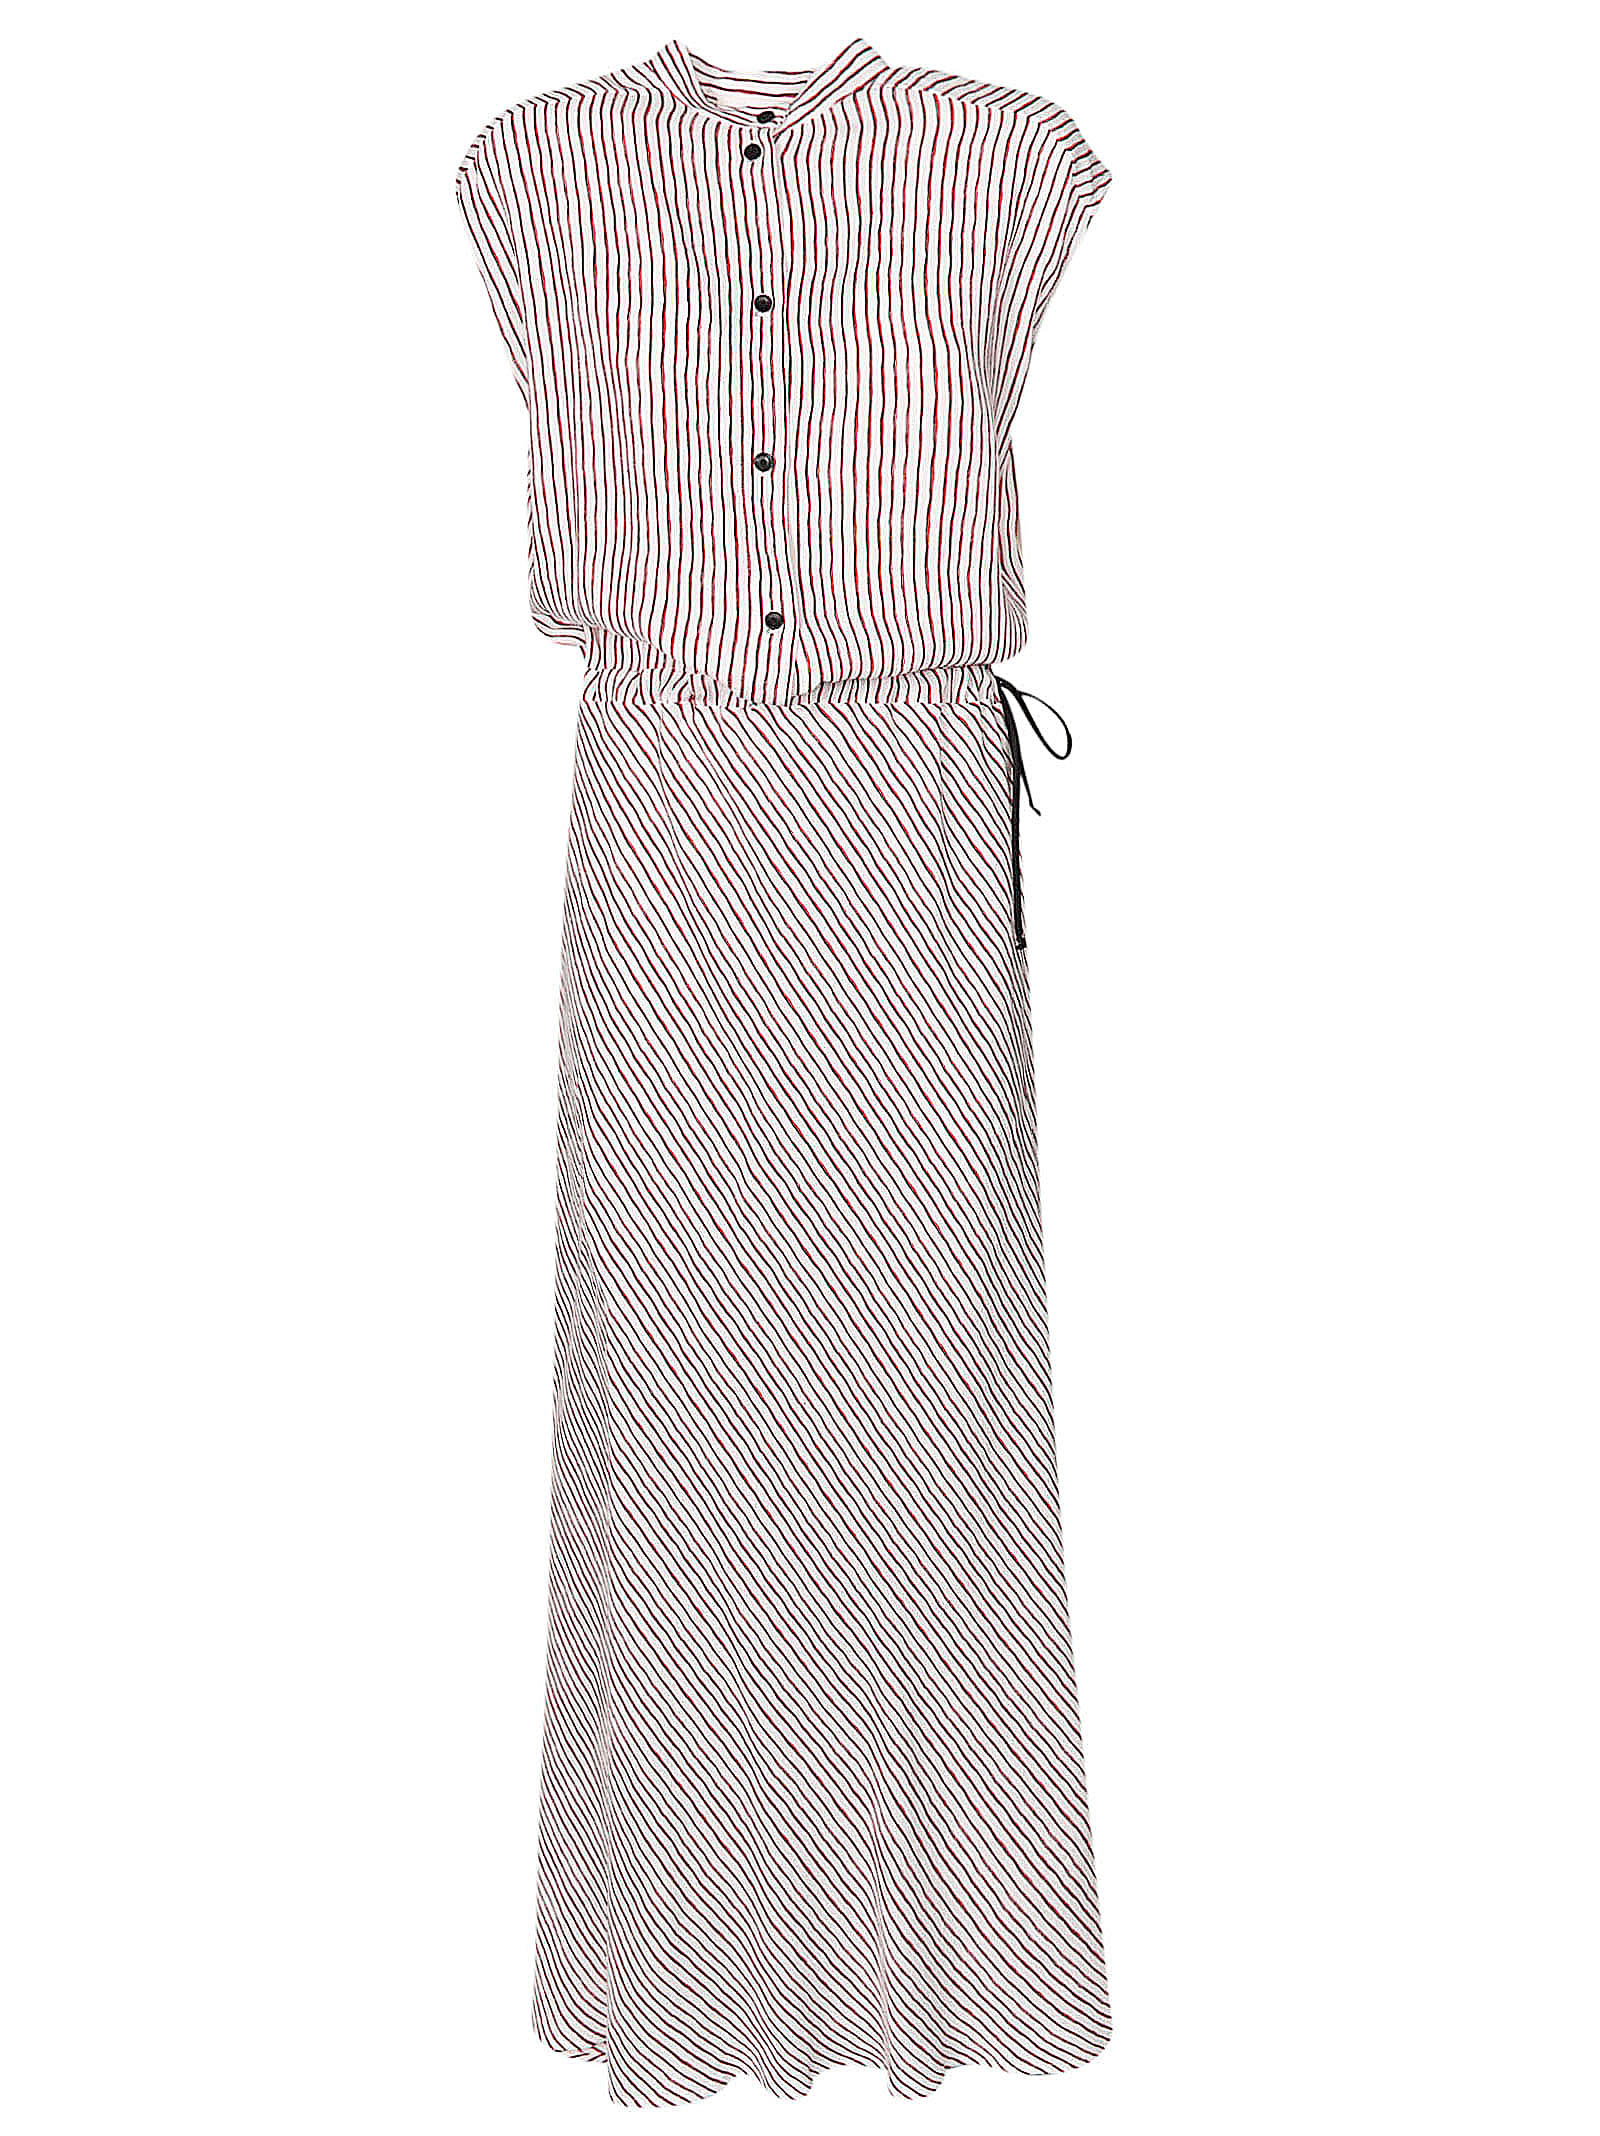 8PM Striped Dress